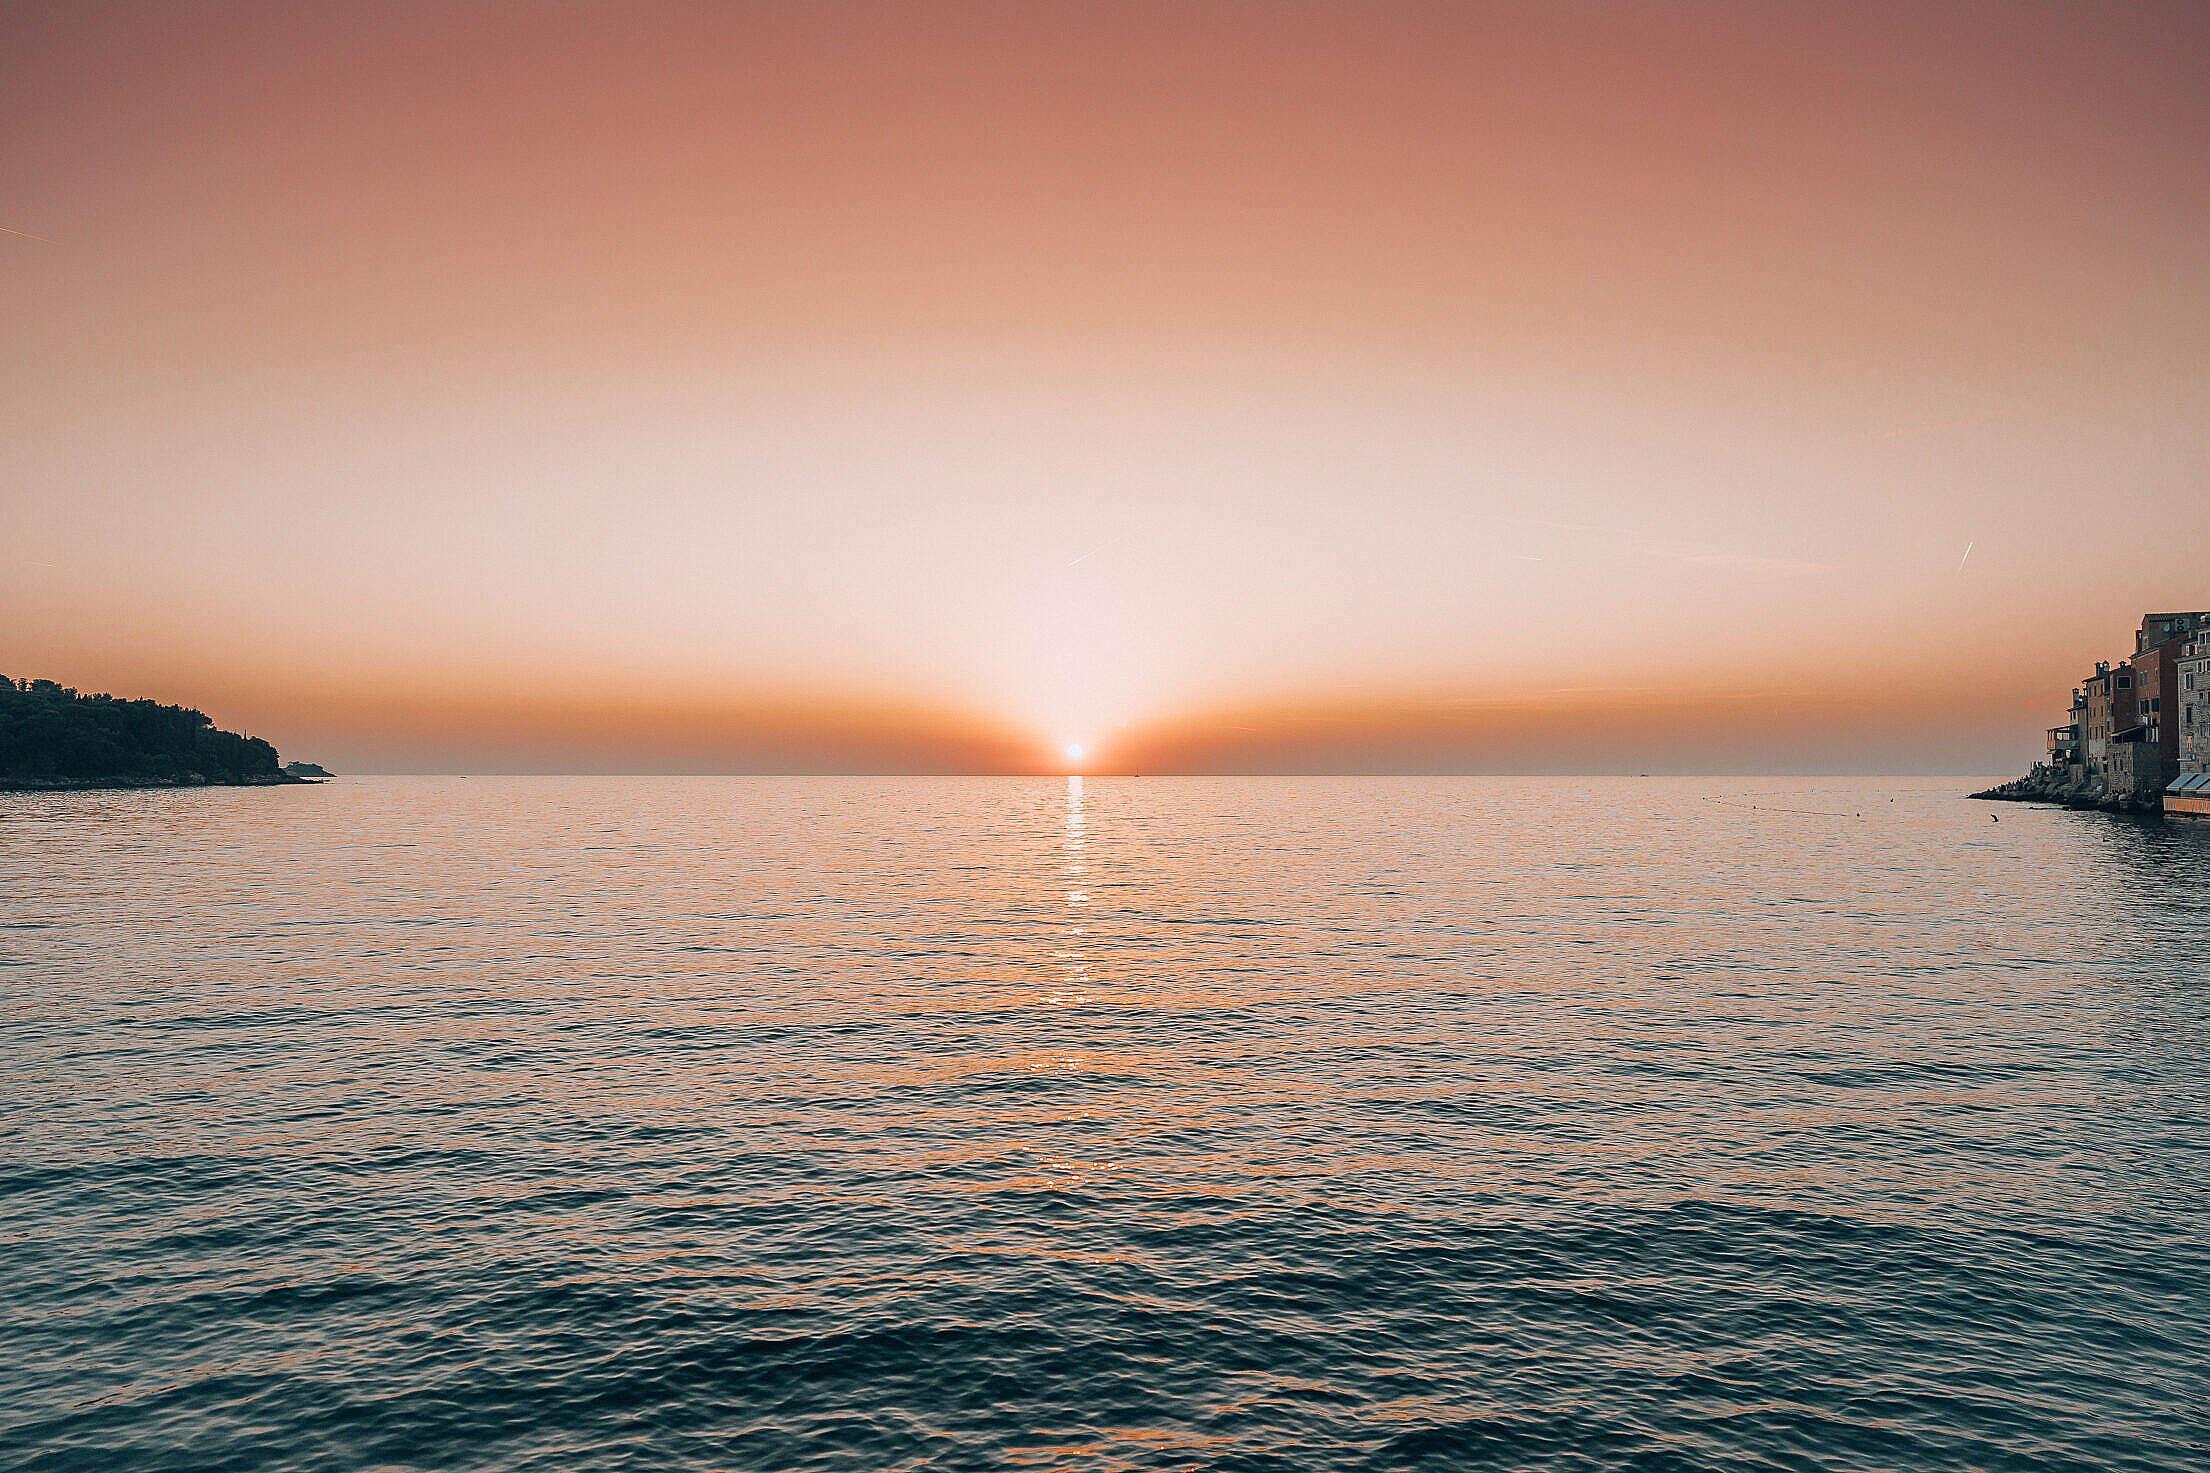 Beautiful Sunset over the Sea in Croatia Free Stock Photo